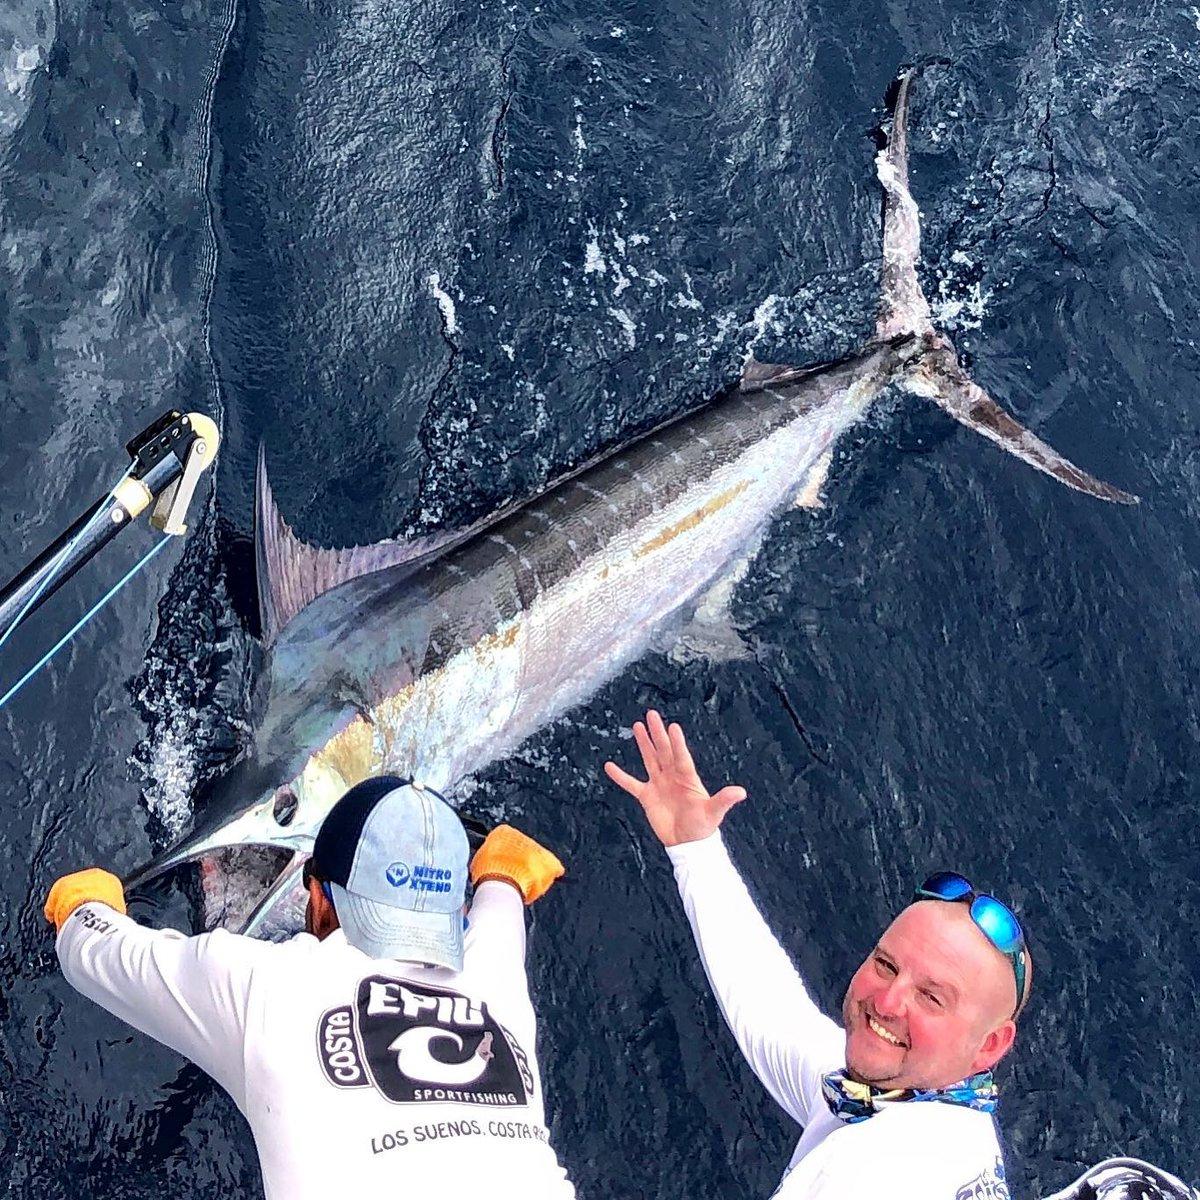 Los Suenos, CR - Epic went 3-3 on Blue Marlin and 2-2 on Sailfish.